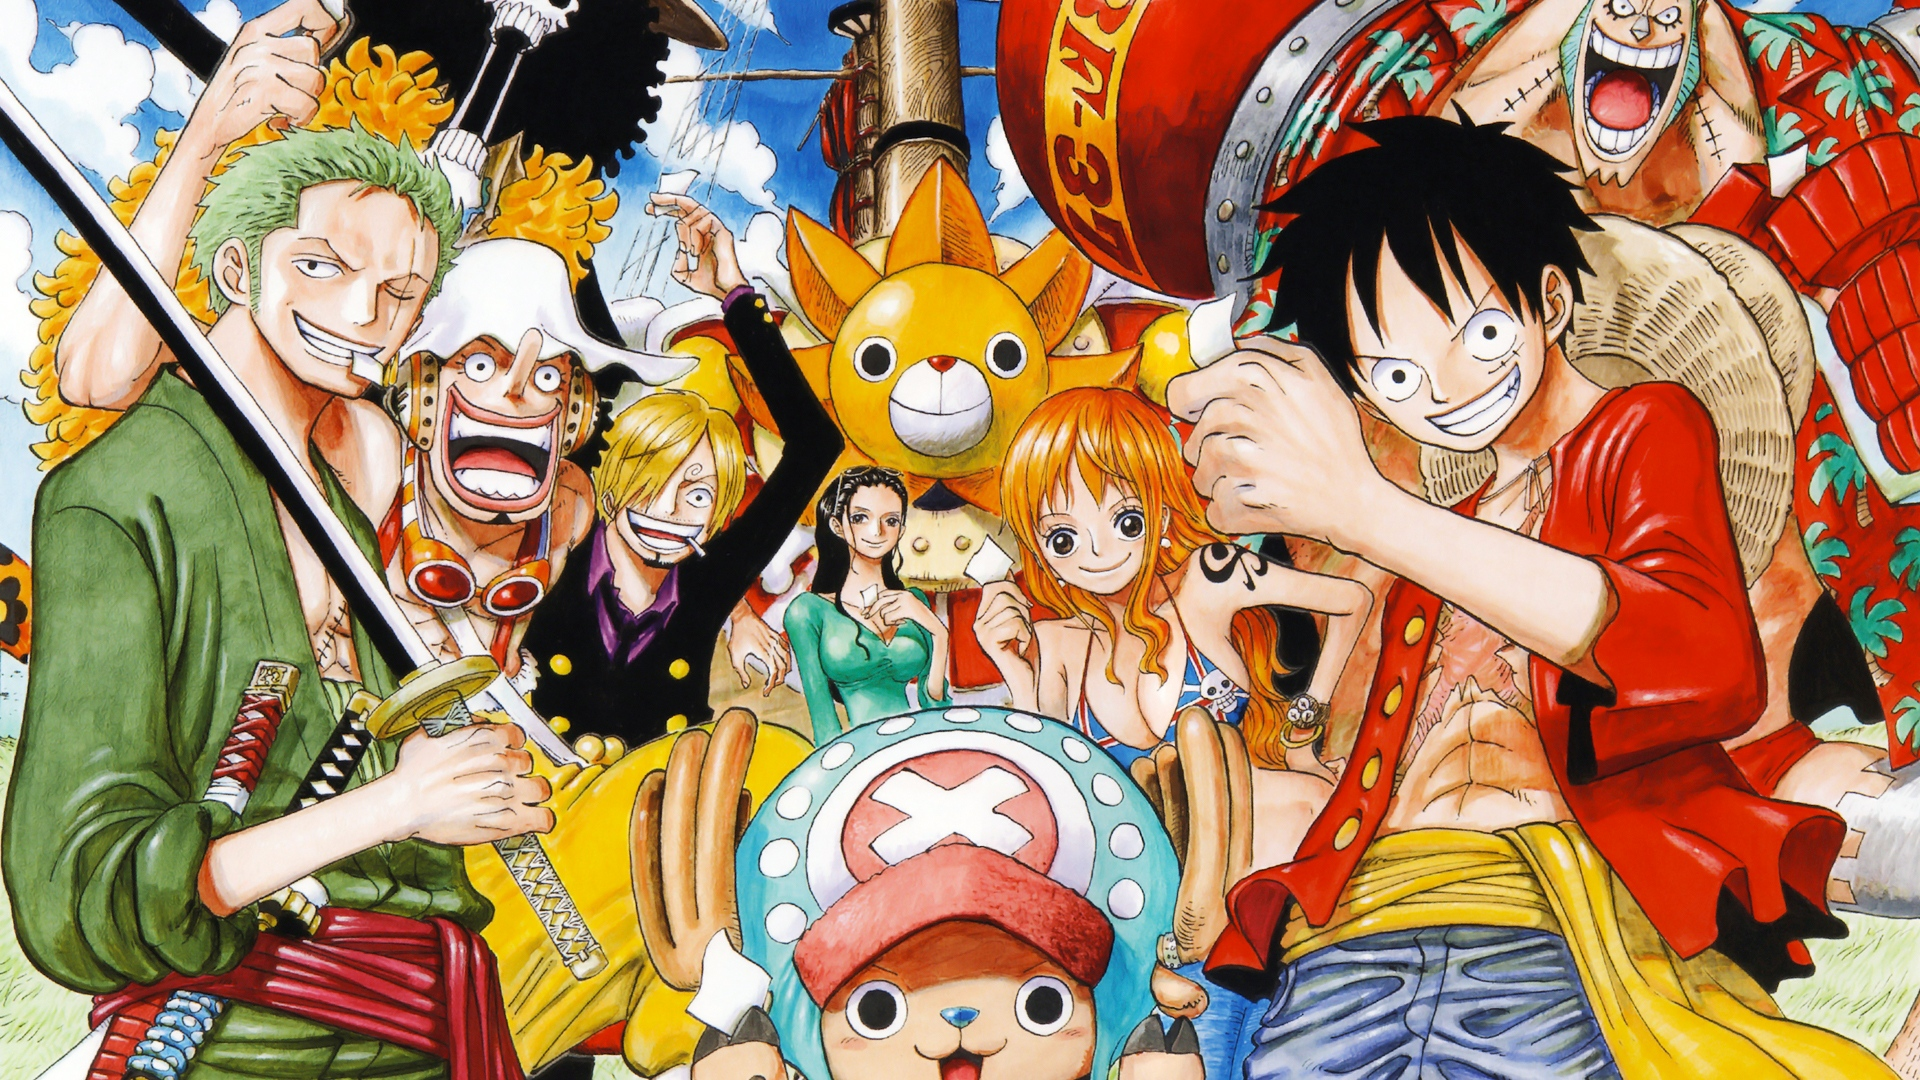 <b>One Piece Wallpaper Desktop</b> - WallpaperSafari